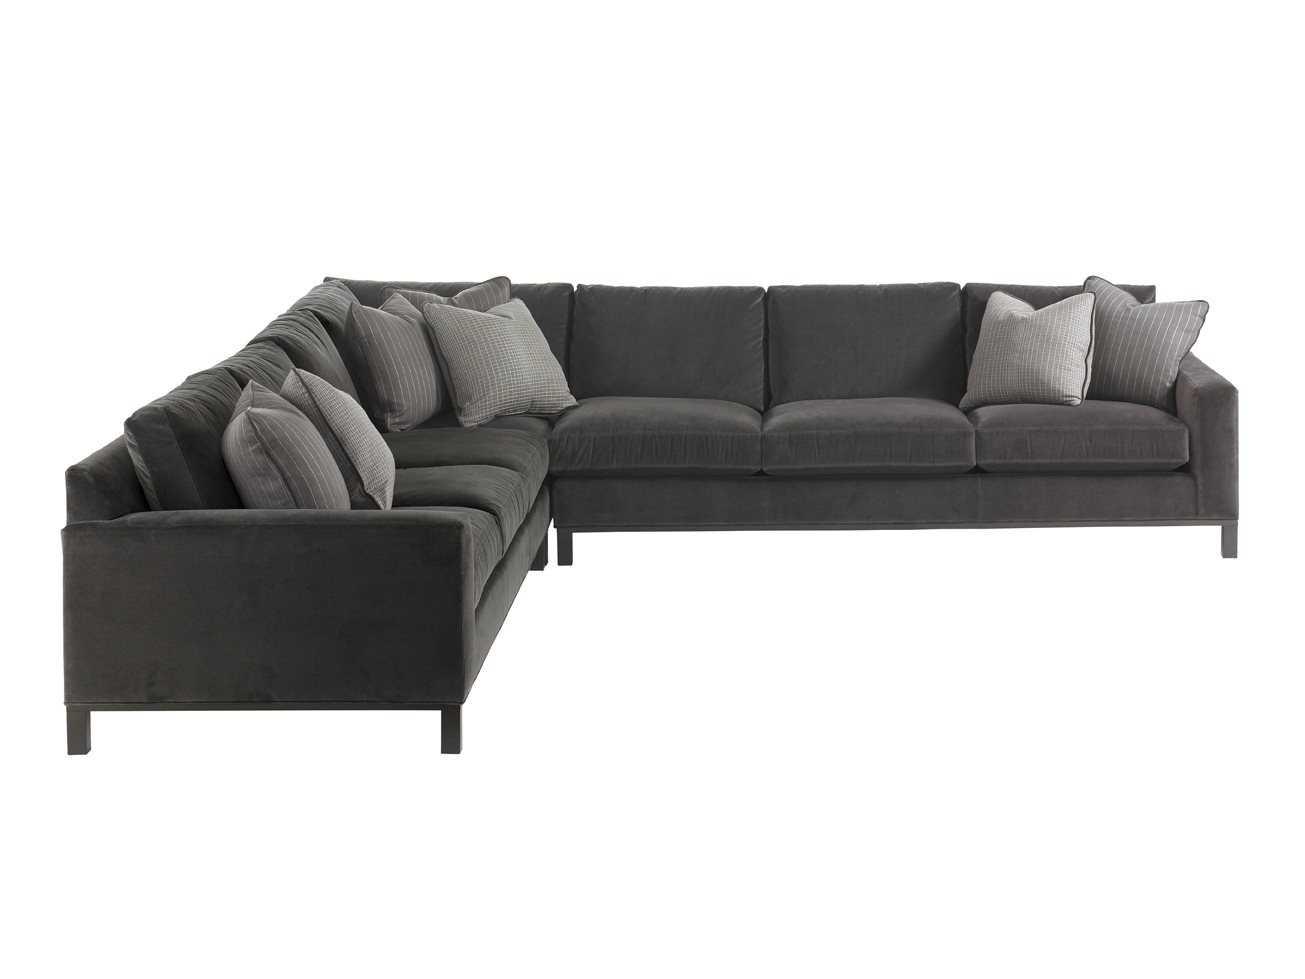 lexington sectional sofa mainstay faux leather sleeper 11 south chronicle lx791053set